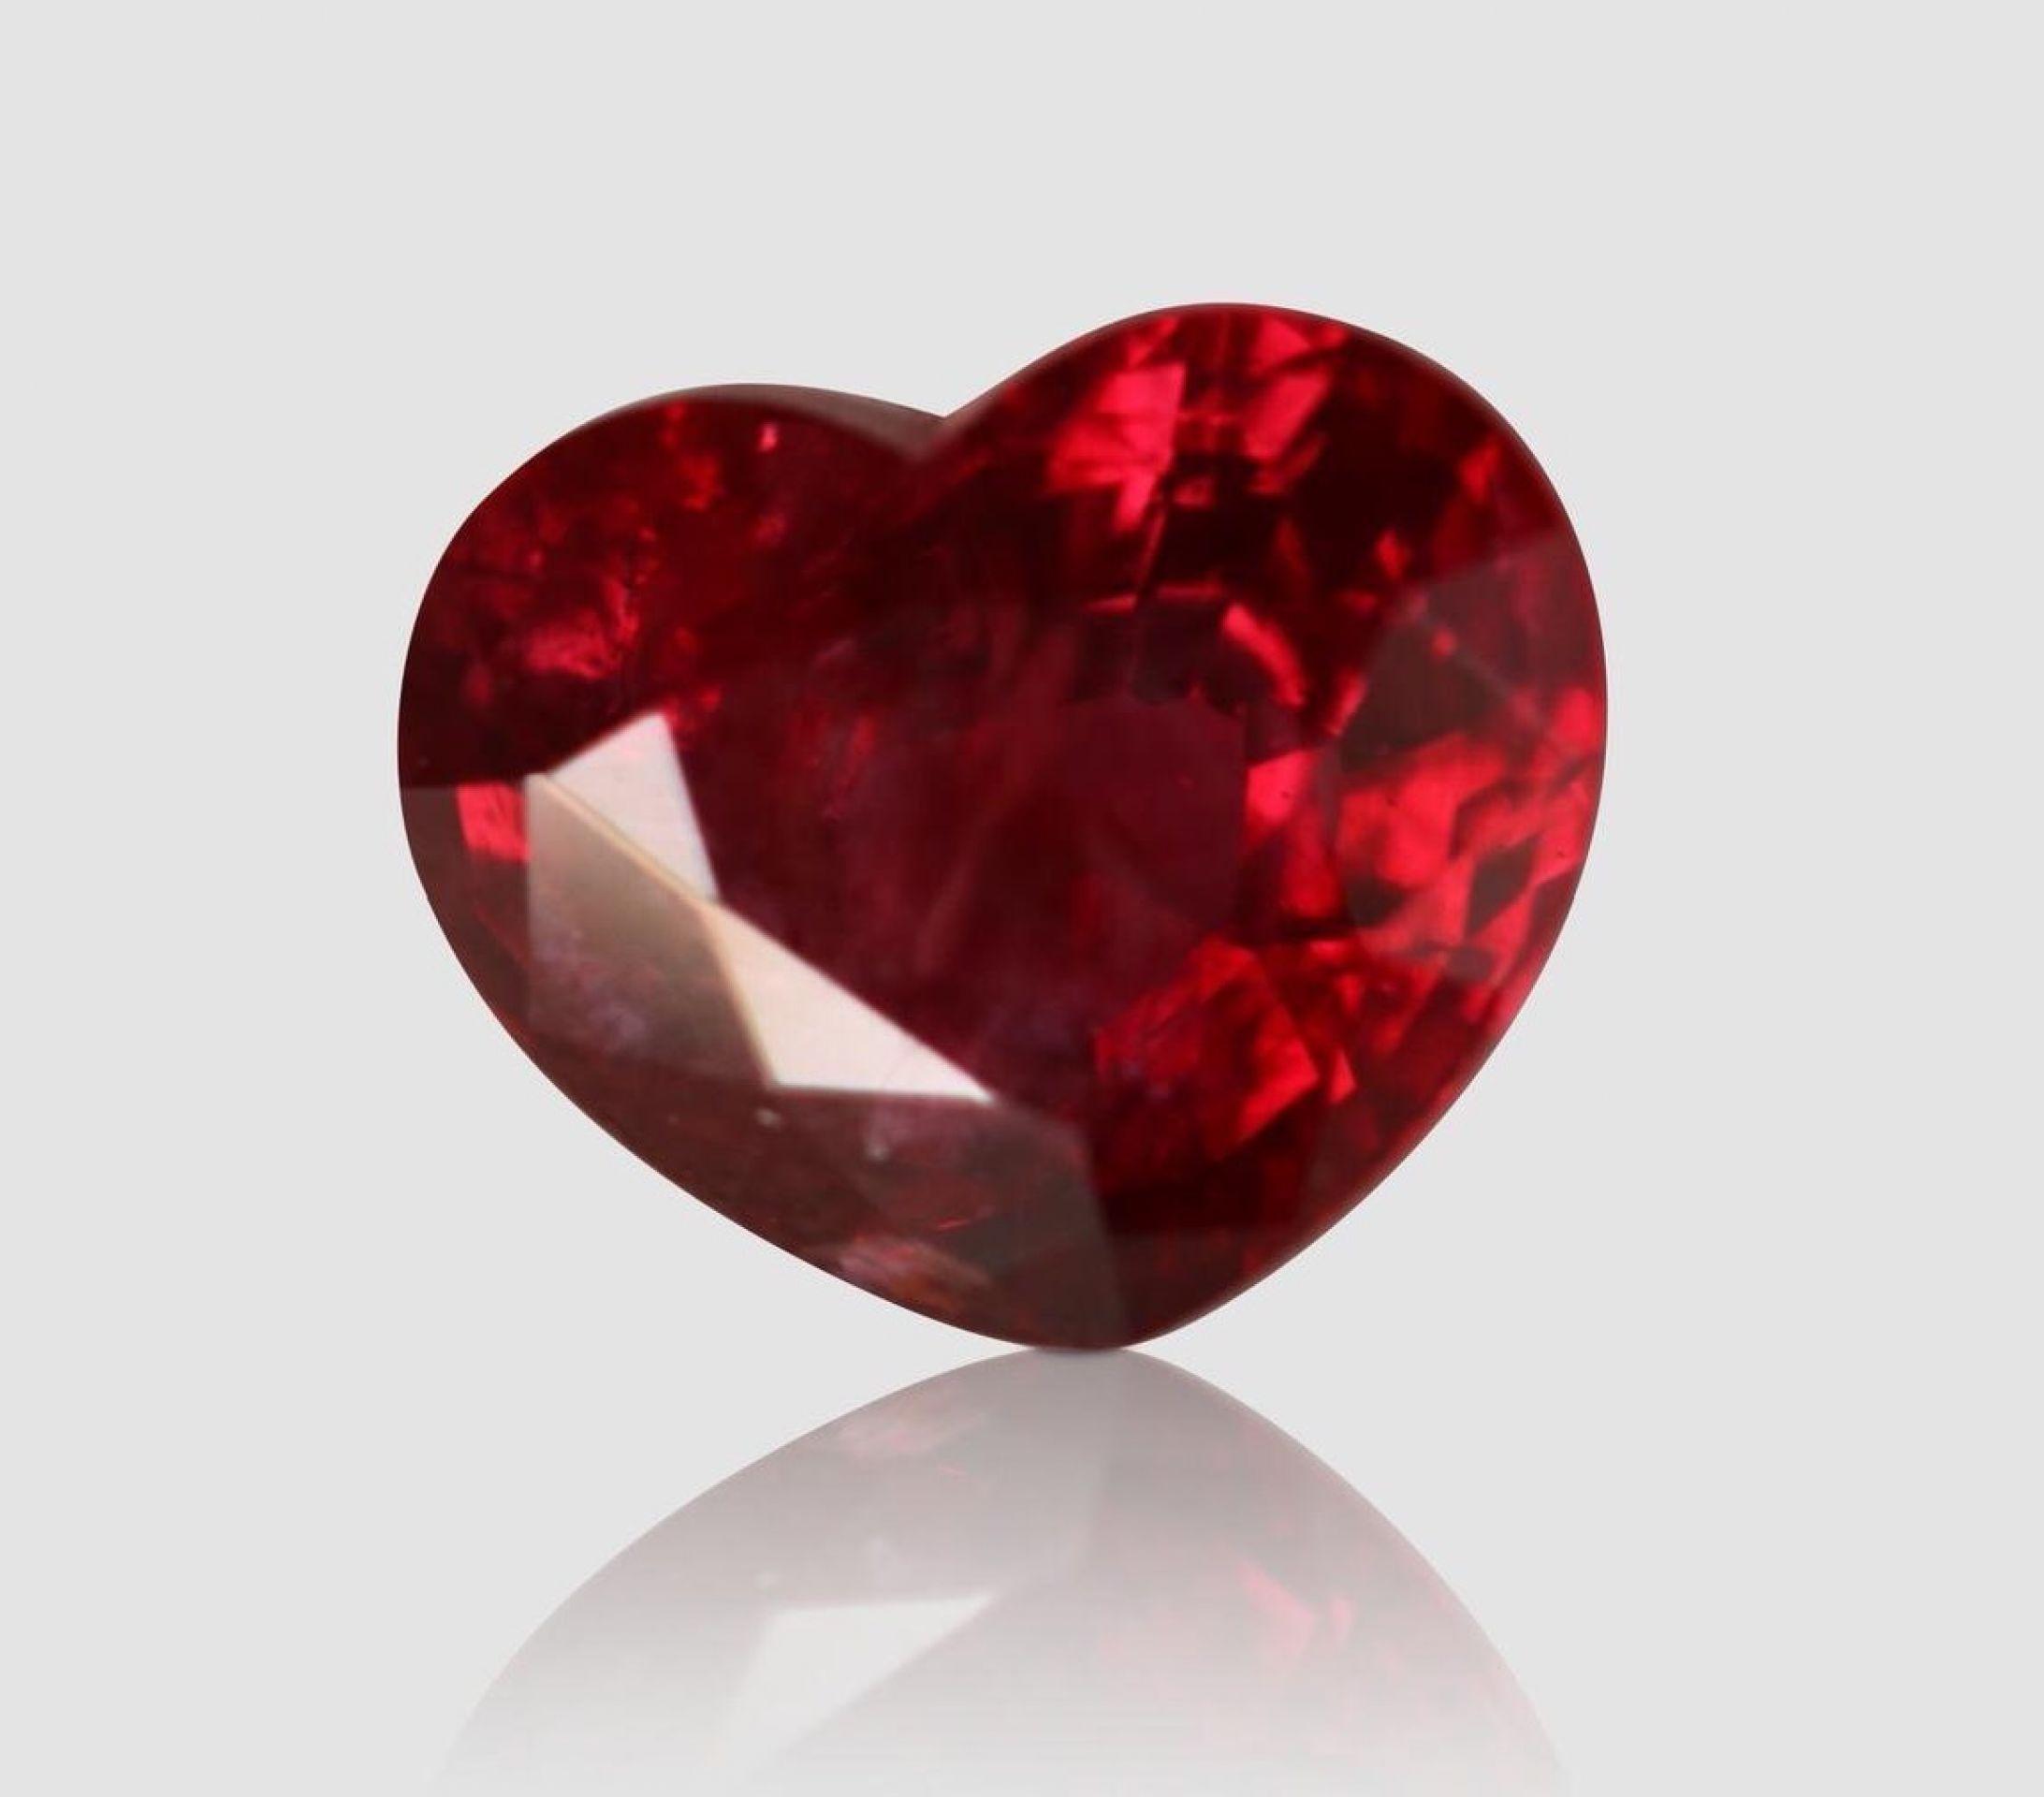 HEART-SHAPED VIVID RED RUBY, 2.27 CARATS, UNHEATED (GRS)